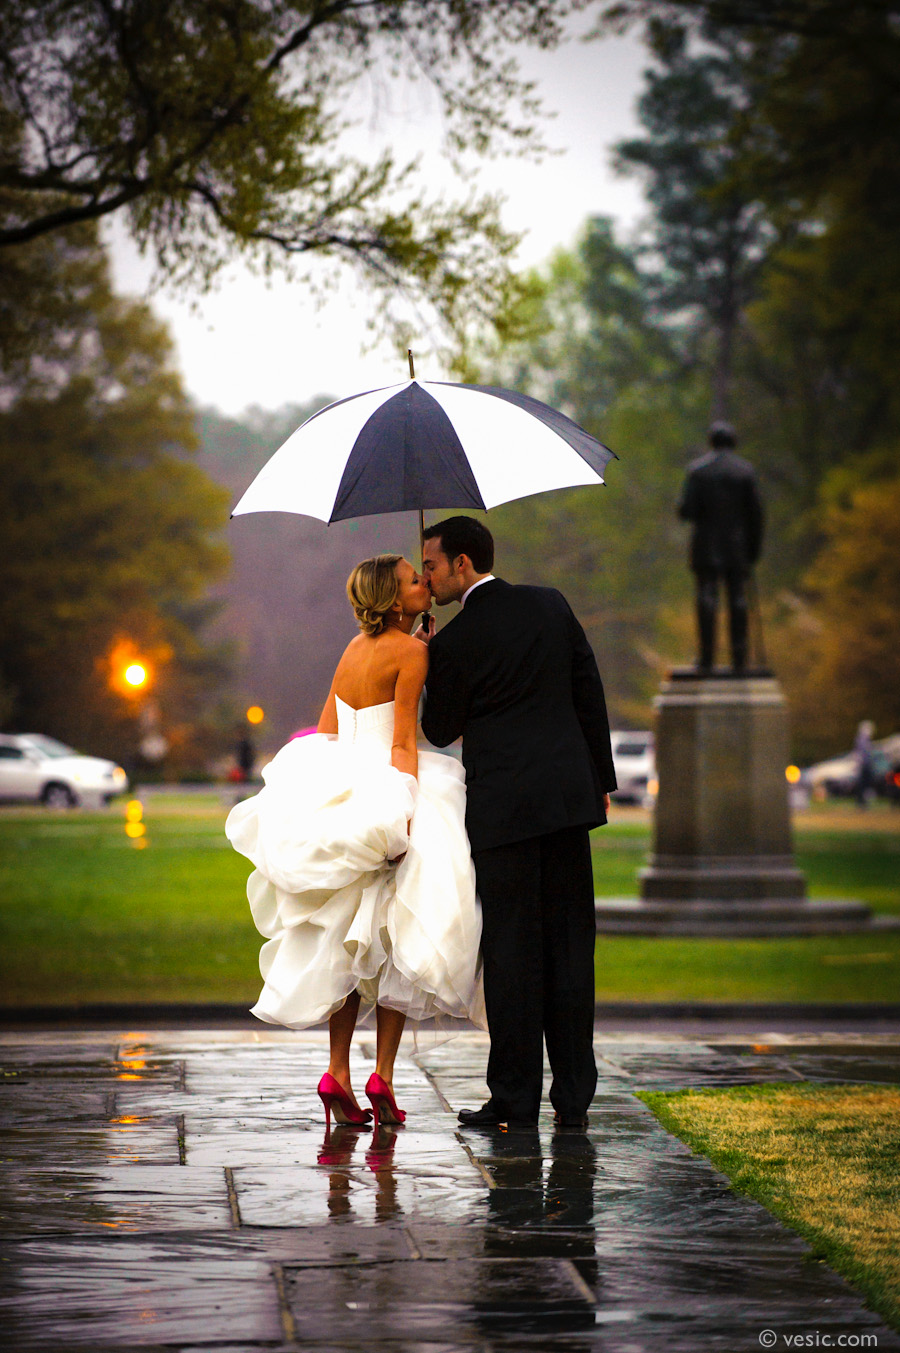 Raining Wedding Photography: Rain On Your Wedding Day